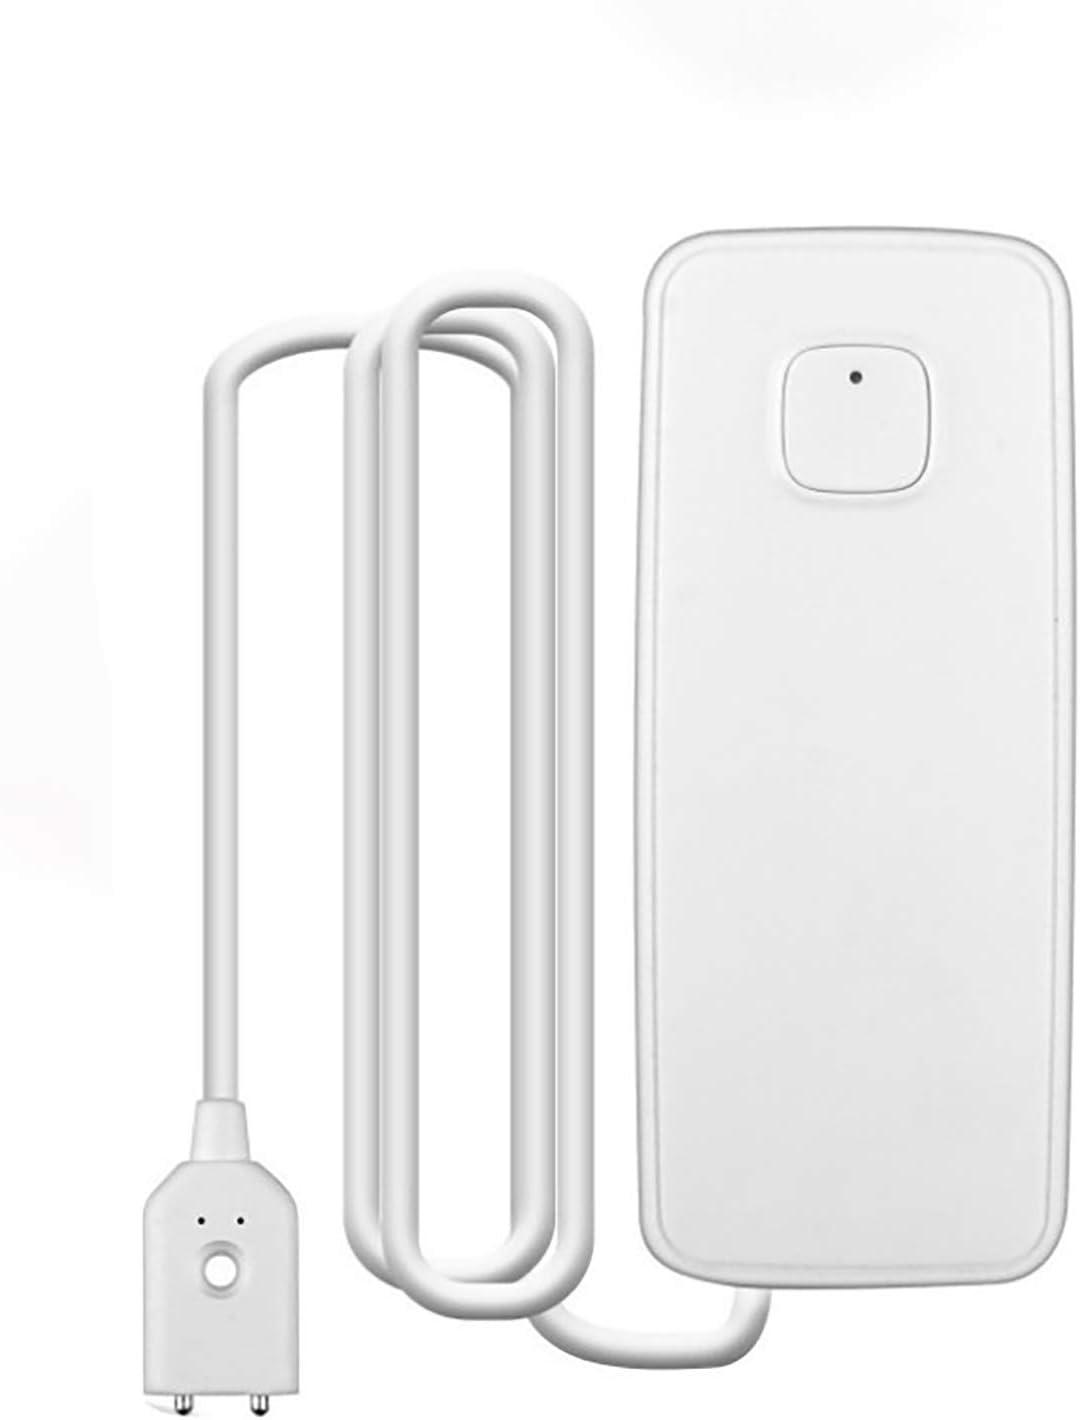 SOLE HOME Water Leak Sensor Alarm, Tuya Smart WiFi Water Leakage Intrusion Detector Alert, Flood Alarm, Home Security Sensor, Work with Smart Life APP, No Hub Required